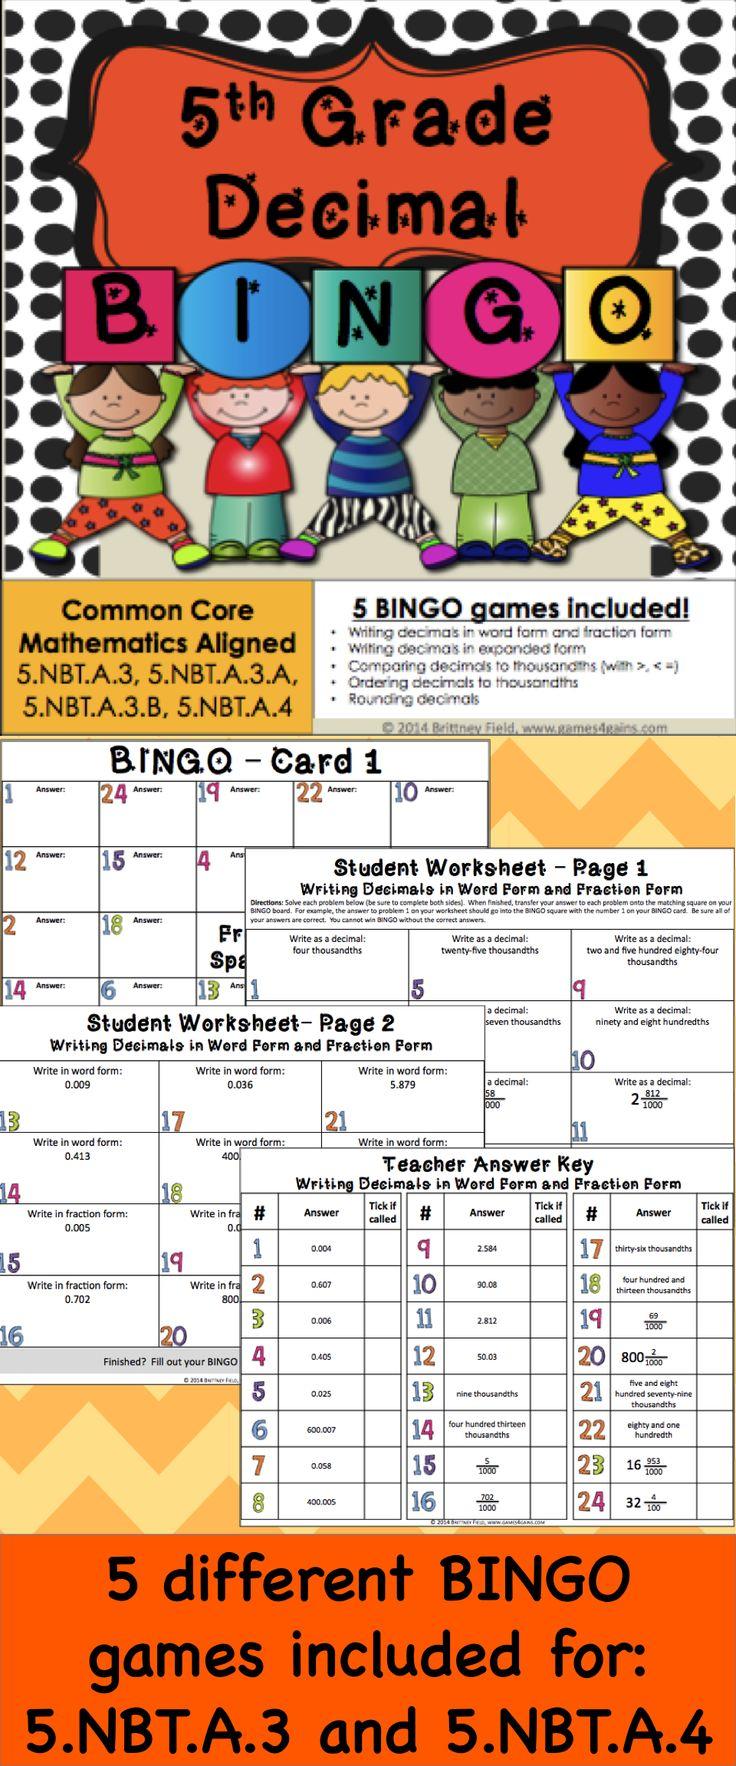 5th Grade Decimal Games 5 Decimal Bingo Games (5nbt3, 5nbt4)  Bingo, Plays And Common Core